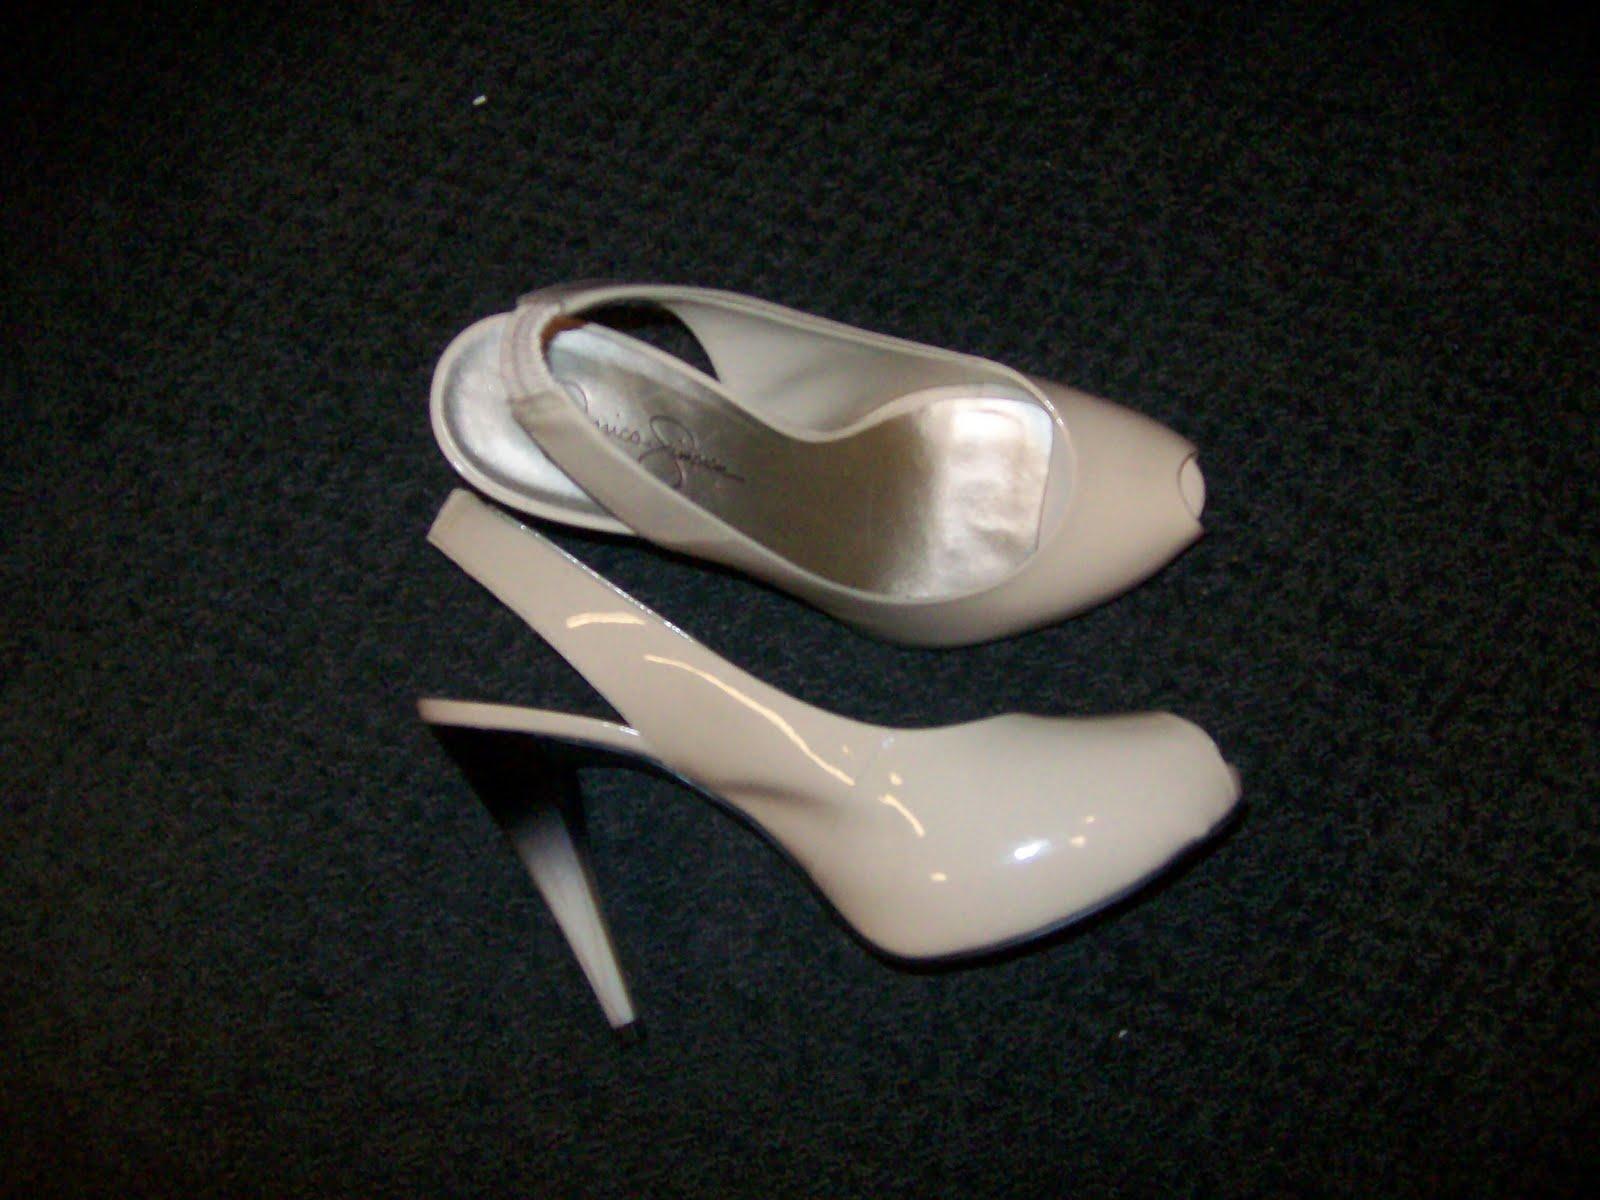 http://2.bp.blogspot.com/_sBm6TOYZh0o/S7tpOMYQA2I/AAAAAAAABnY/QTjE58pywBc/s1600/shoes.jpg